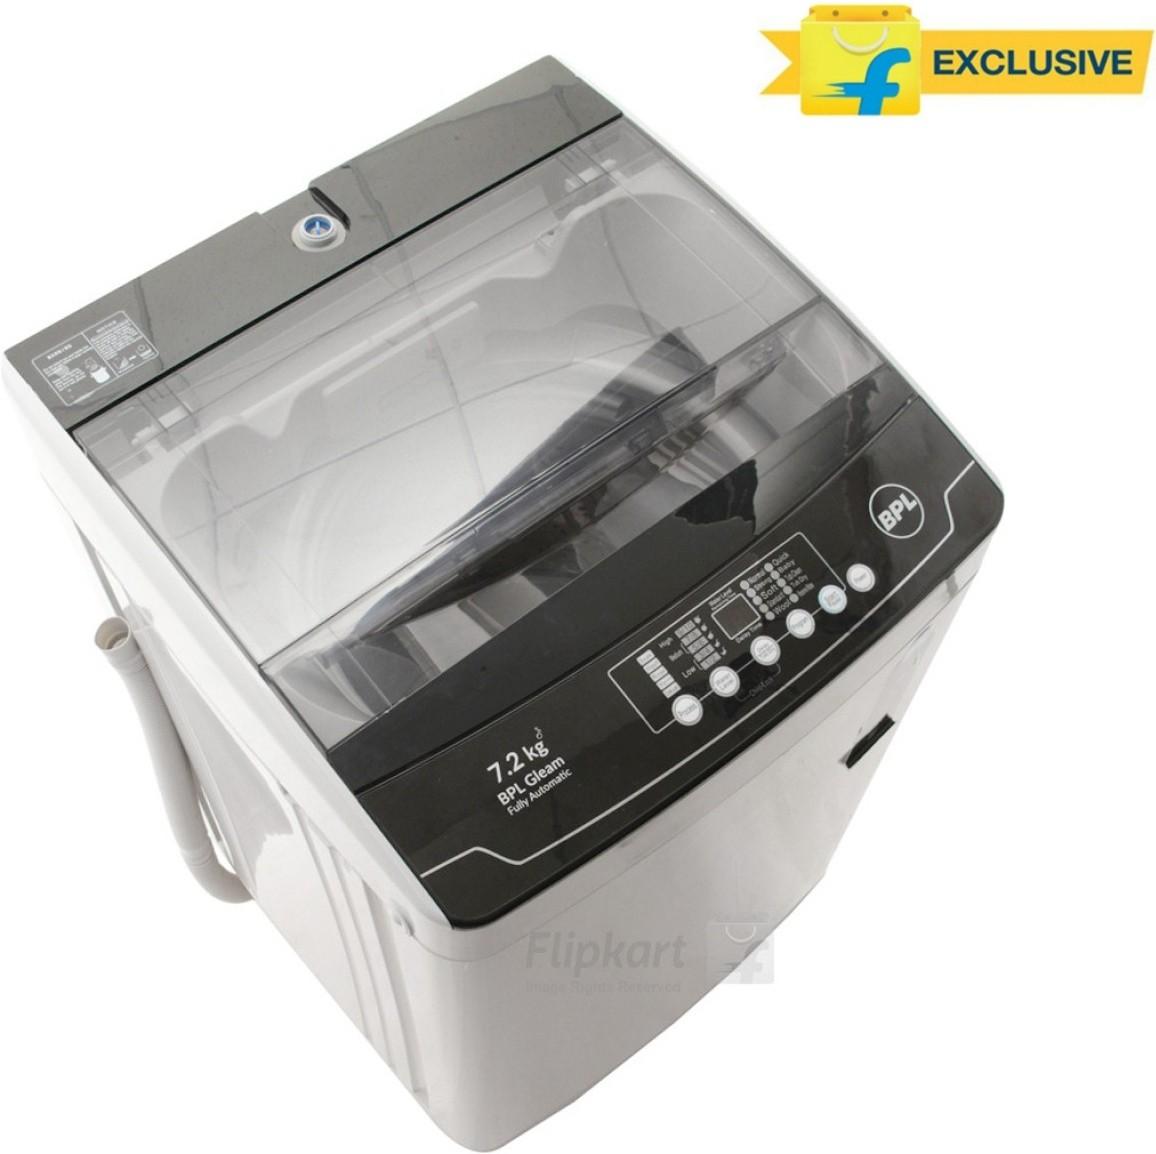 Deals | Just Rs.14,990 BPL 7.2 kg Washing Machine